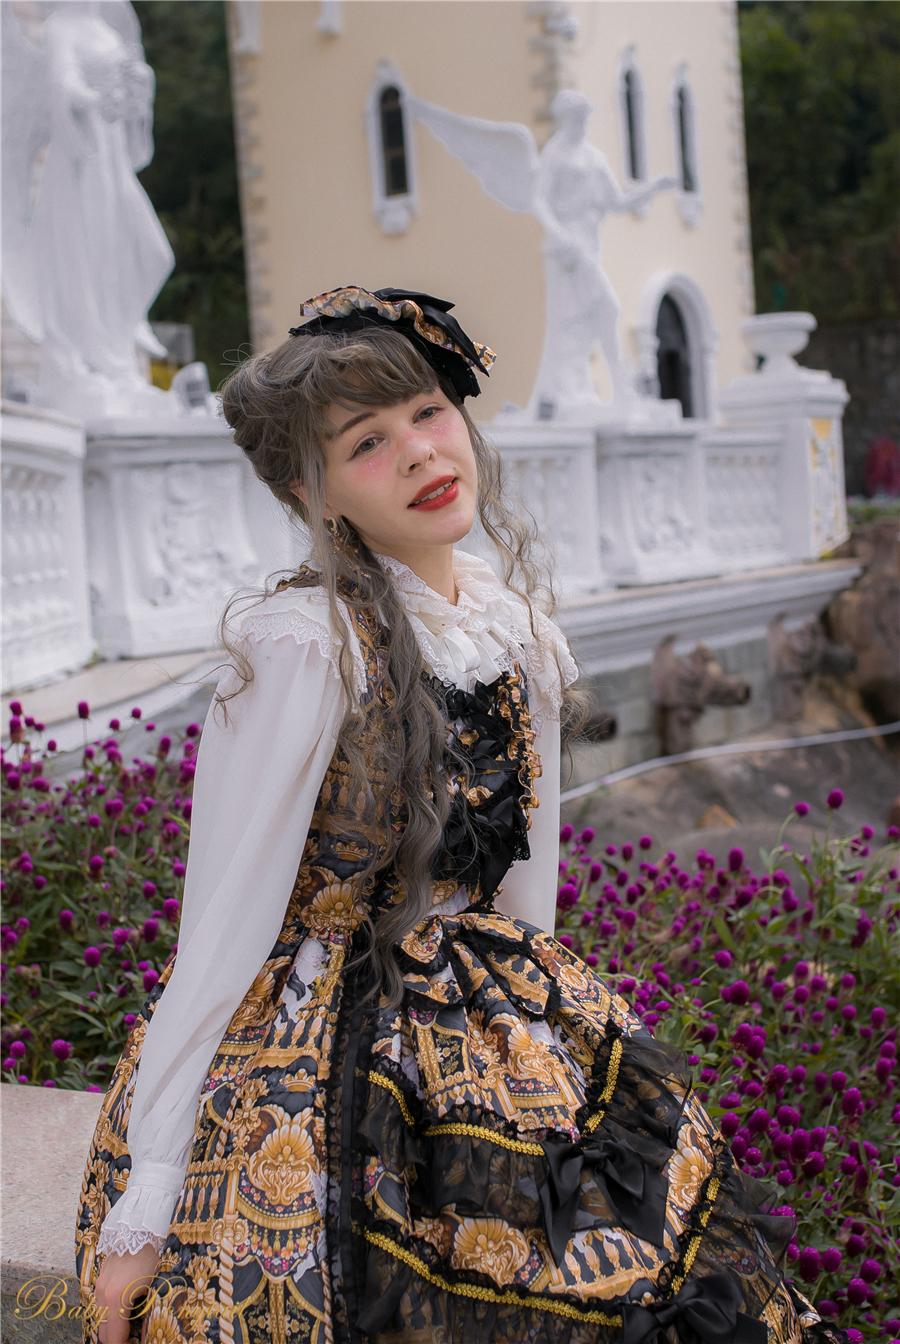 Babyponytail_Model_JSK_Black Present Angel_Claudia_2_4.jpg